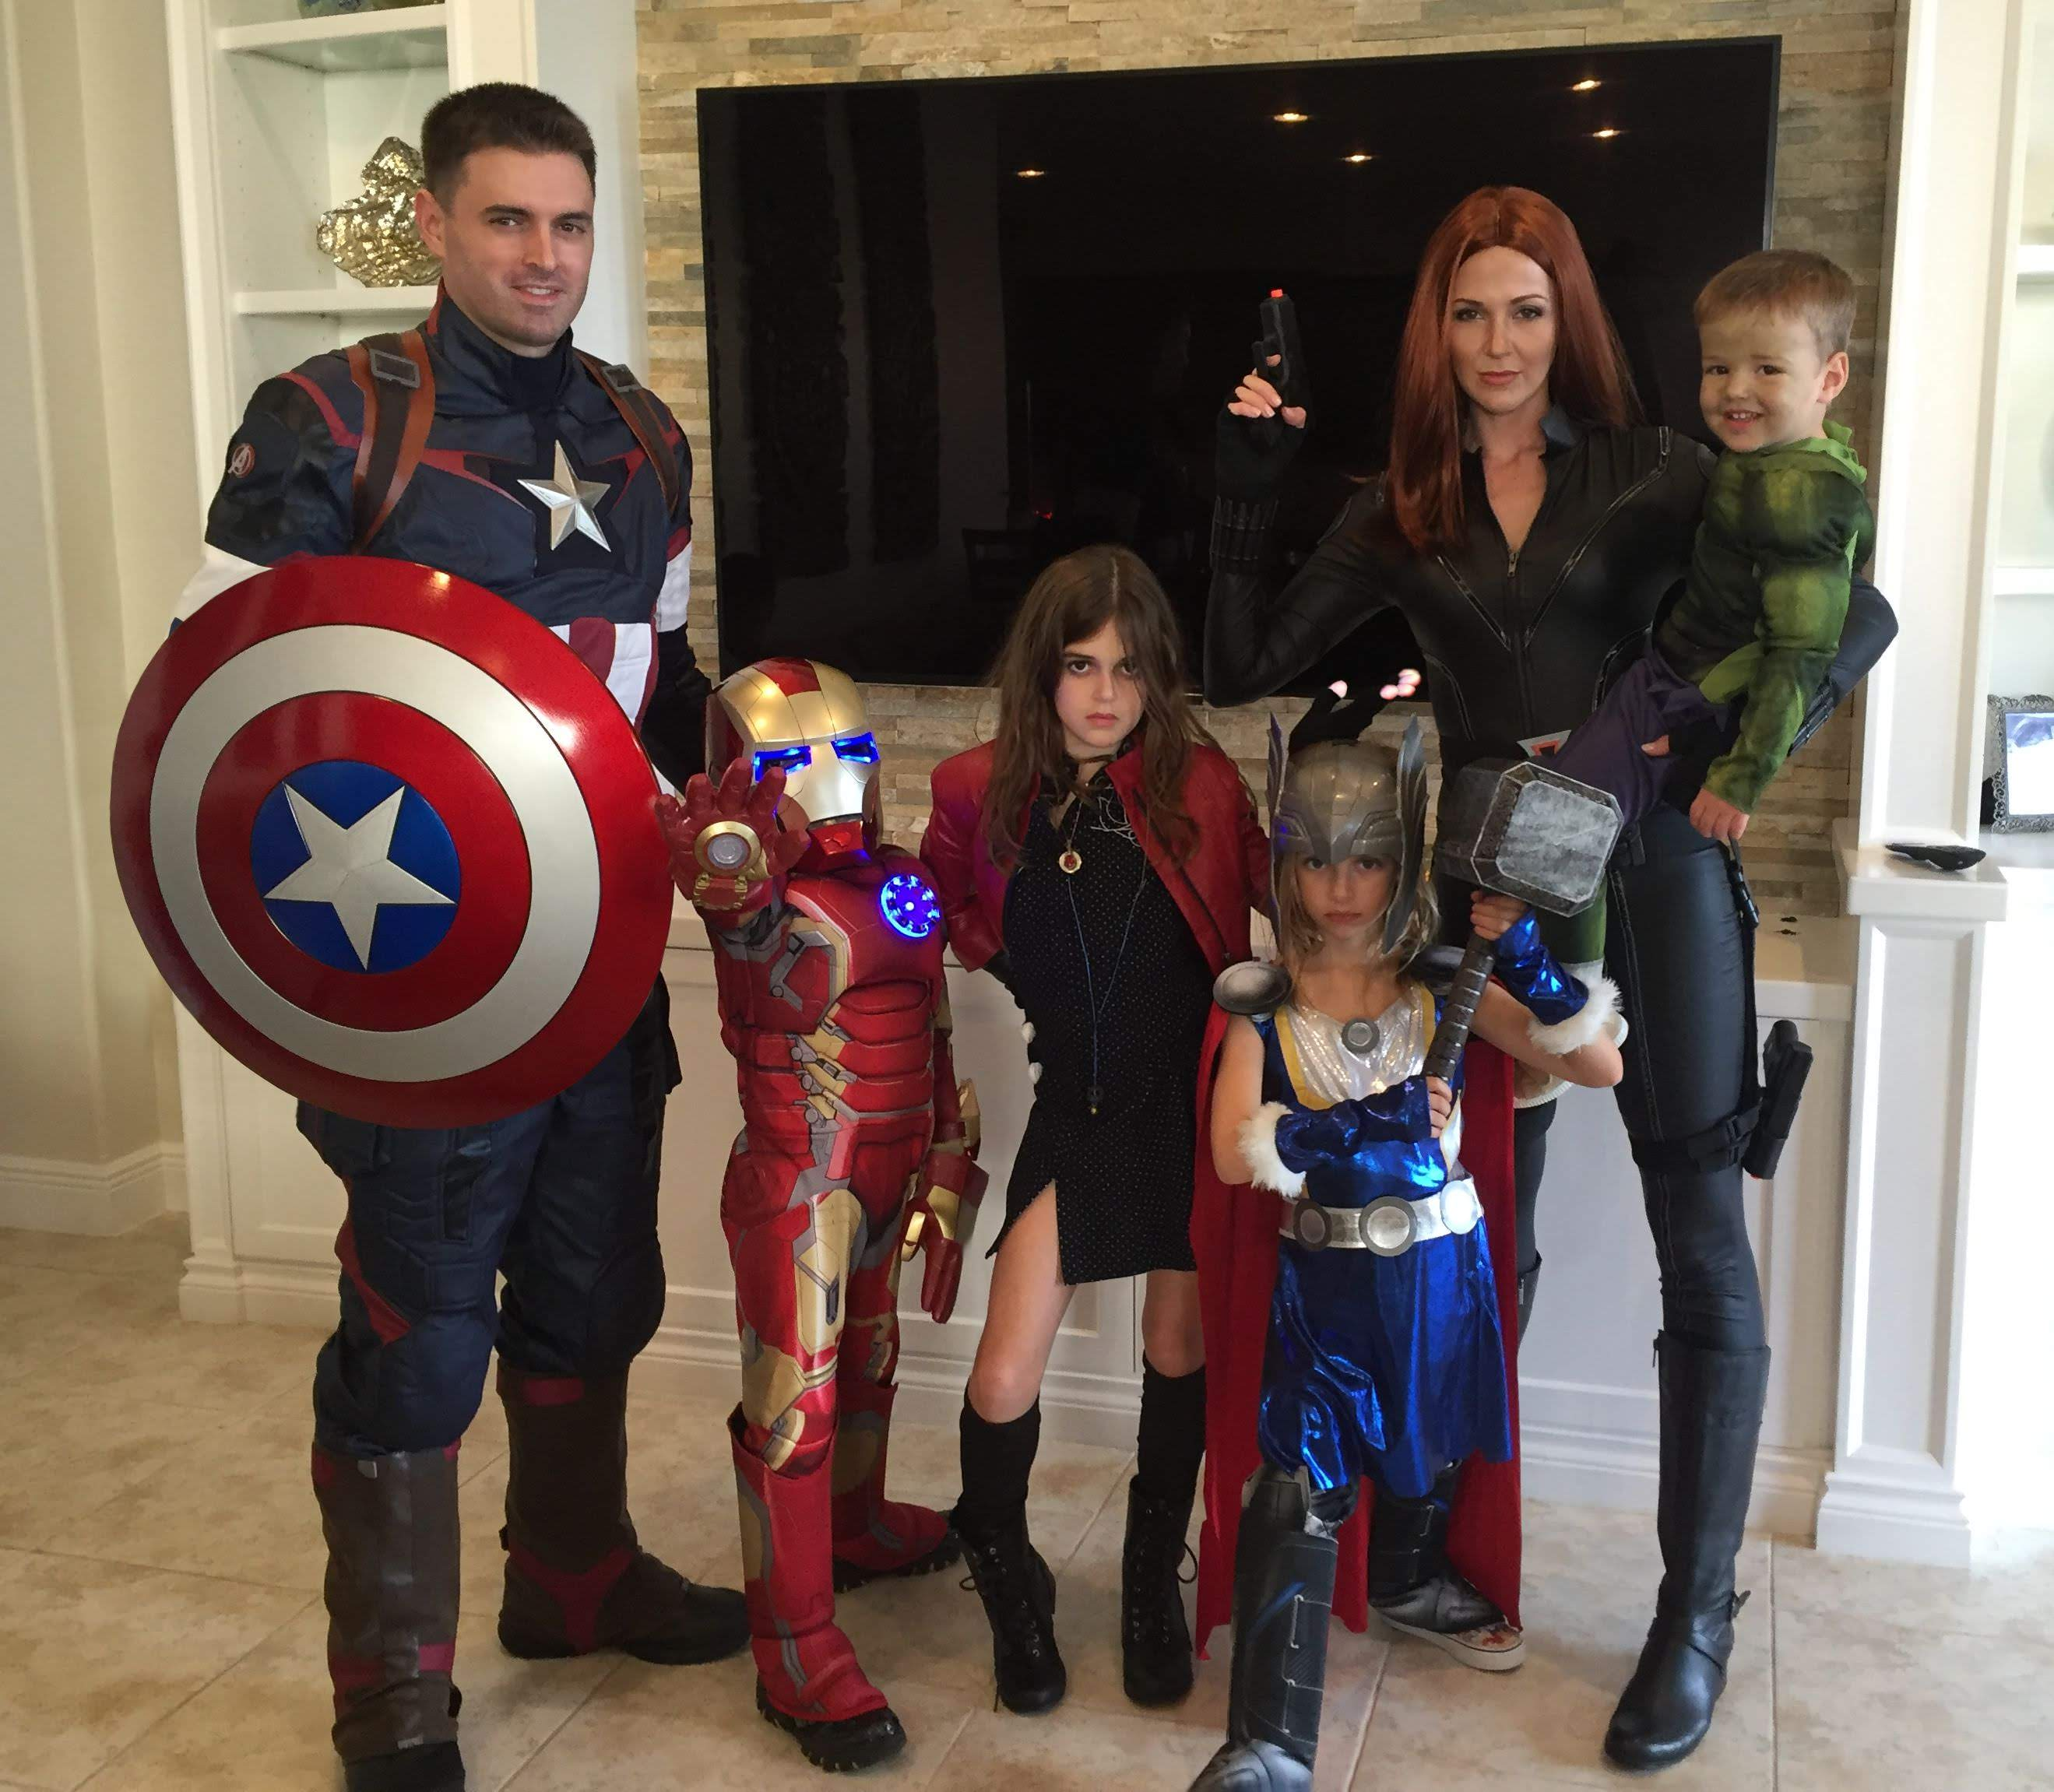 Avengers Infinity Family : ハロウィンの素敵なアベンジャーズ・インフィニティ・ファミリー ! ! 🎃